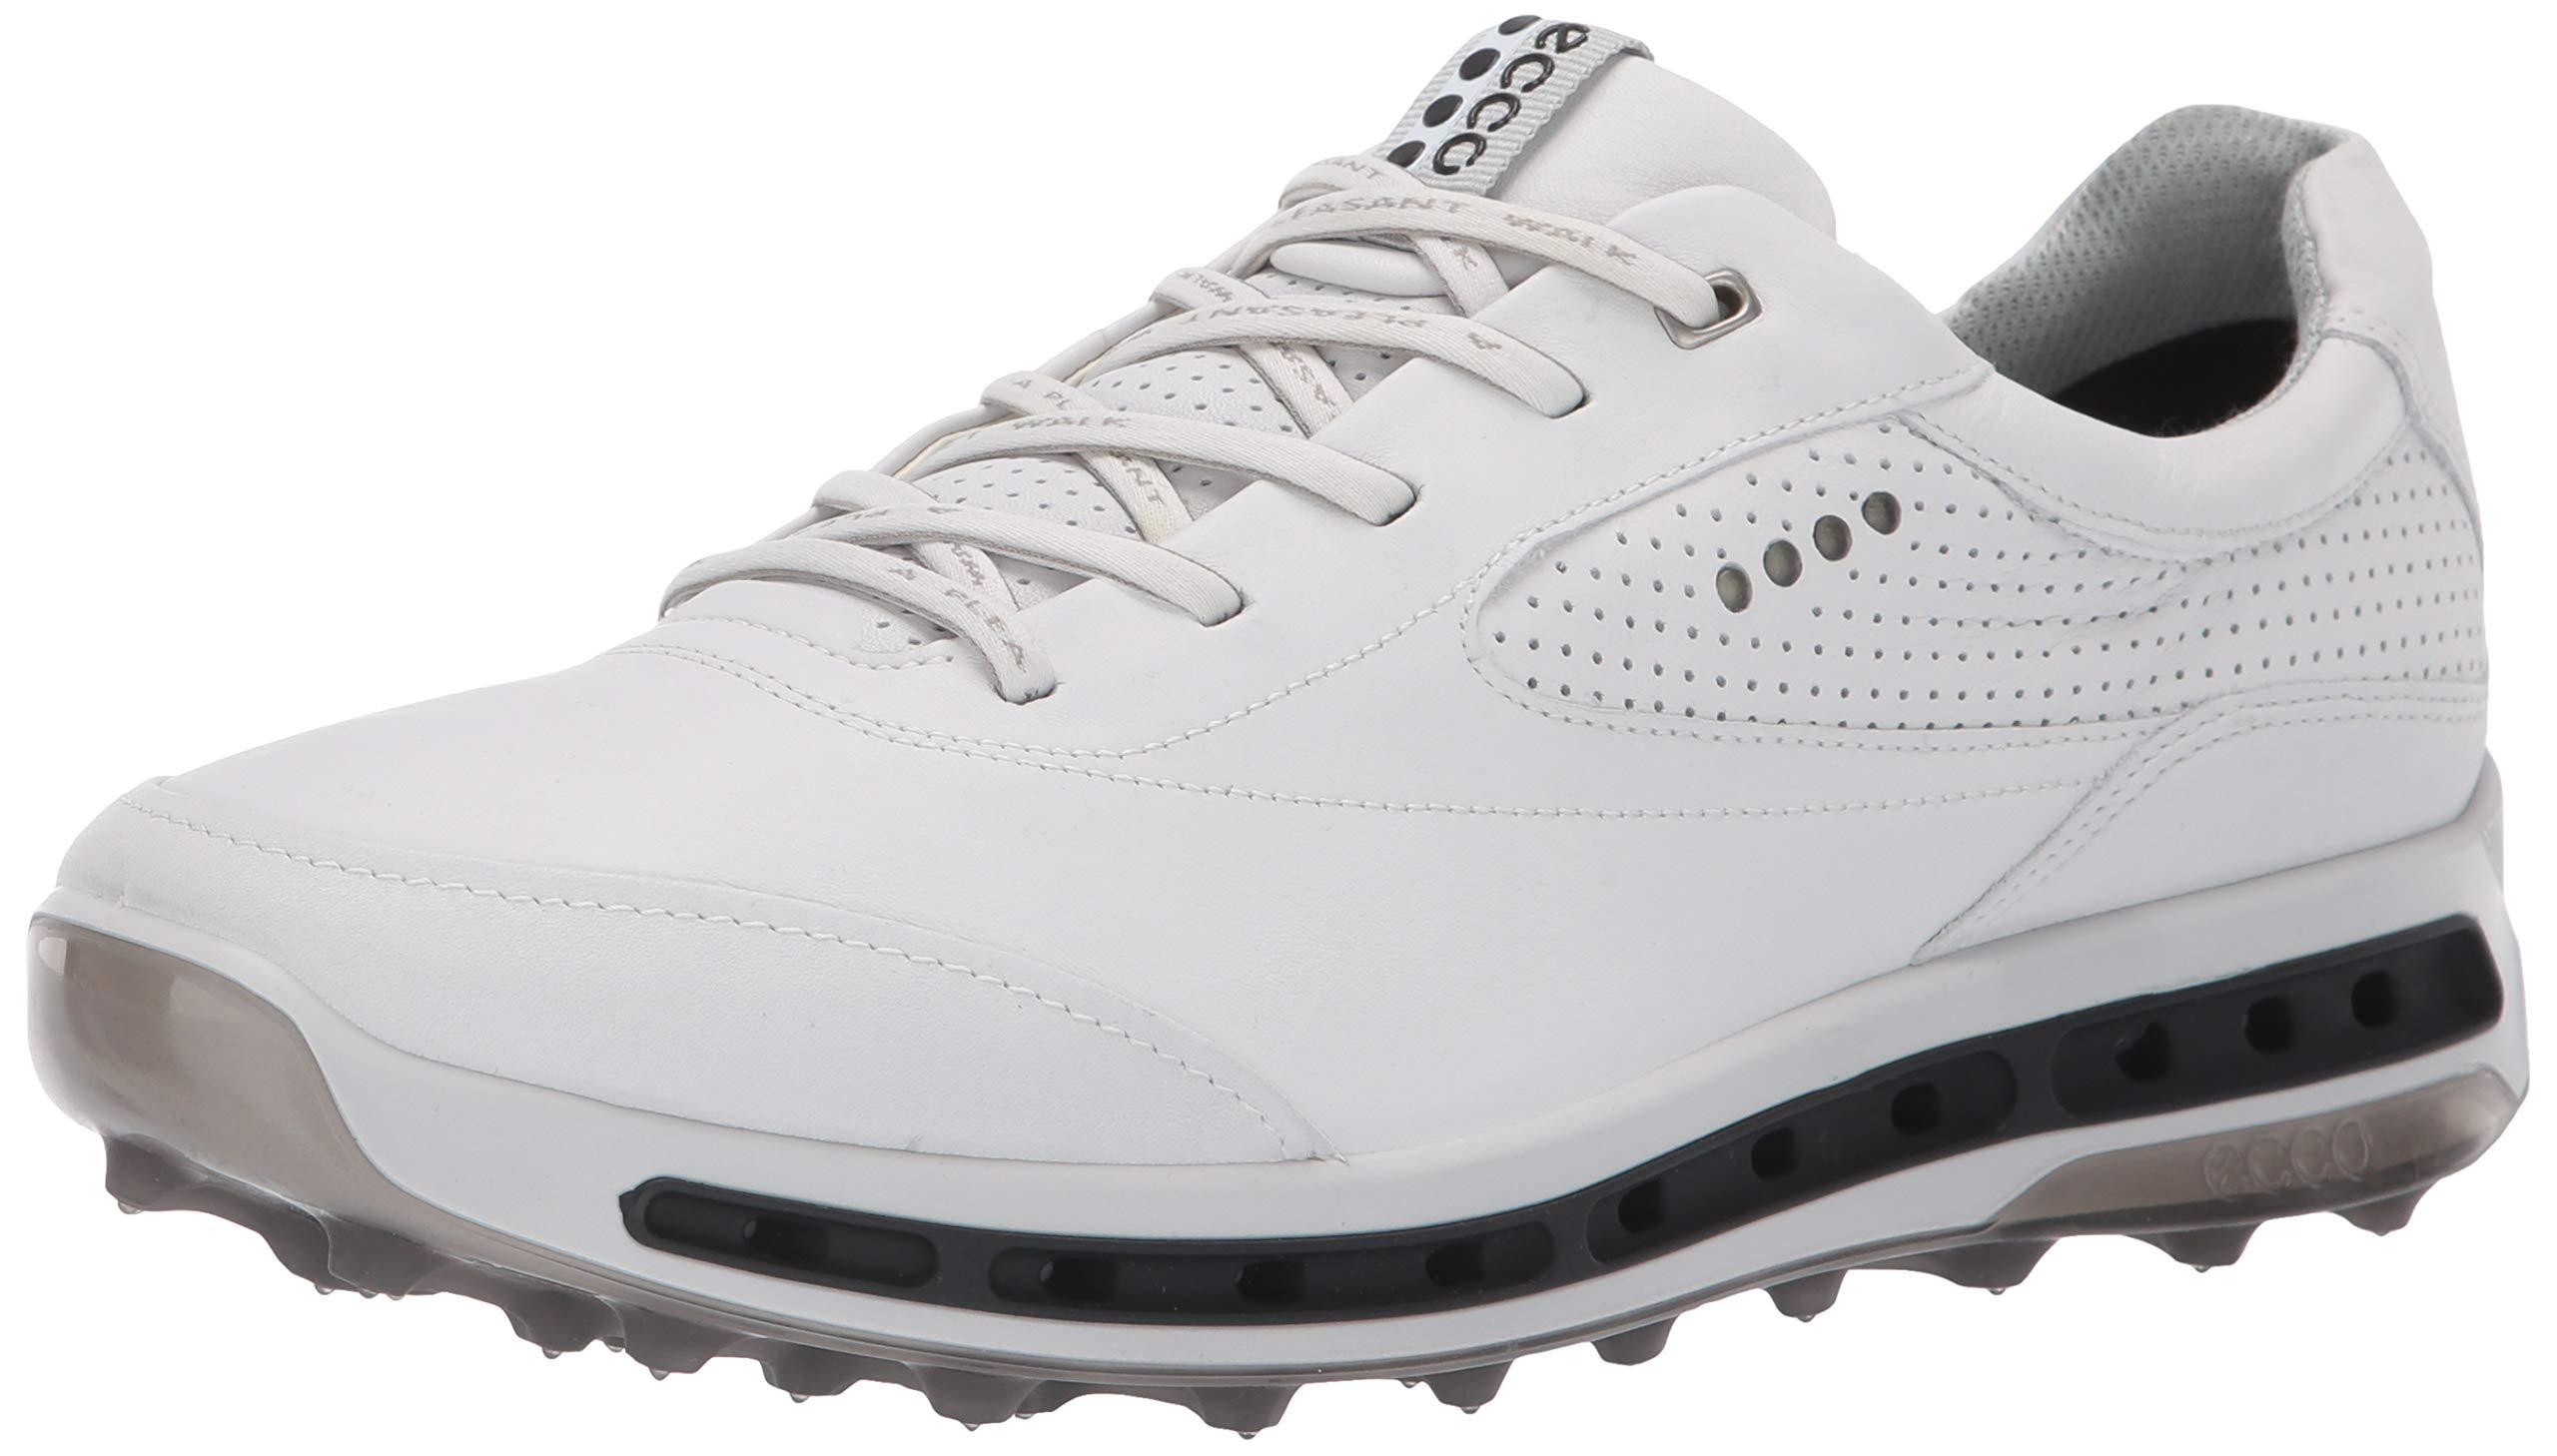 ECCO Men's Cool Pro Gore-TEX Golf Shoe, White/Black/Transparent, 41 M EU (7-7.5 US)